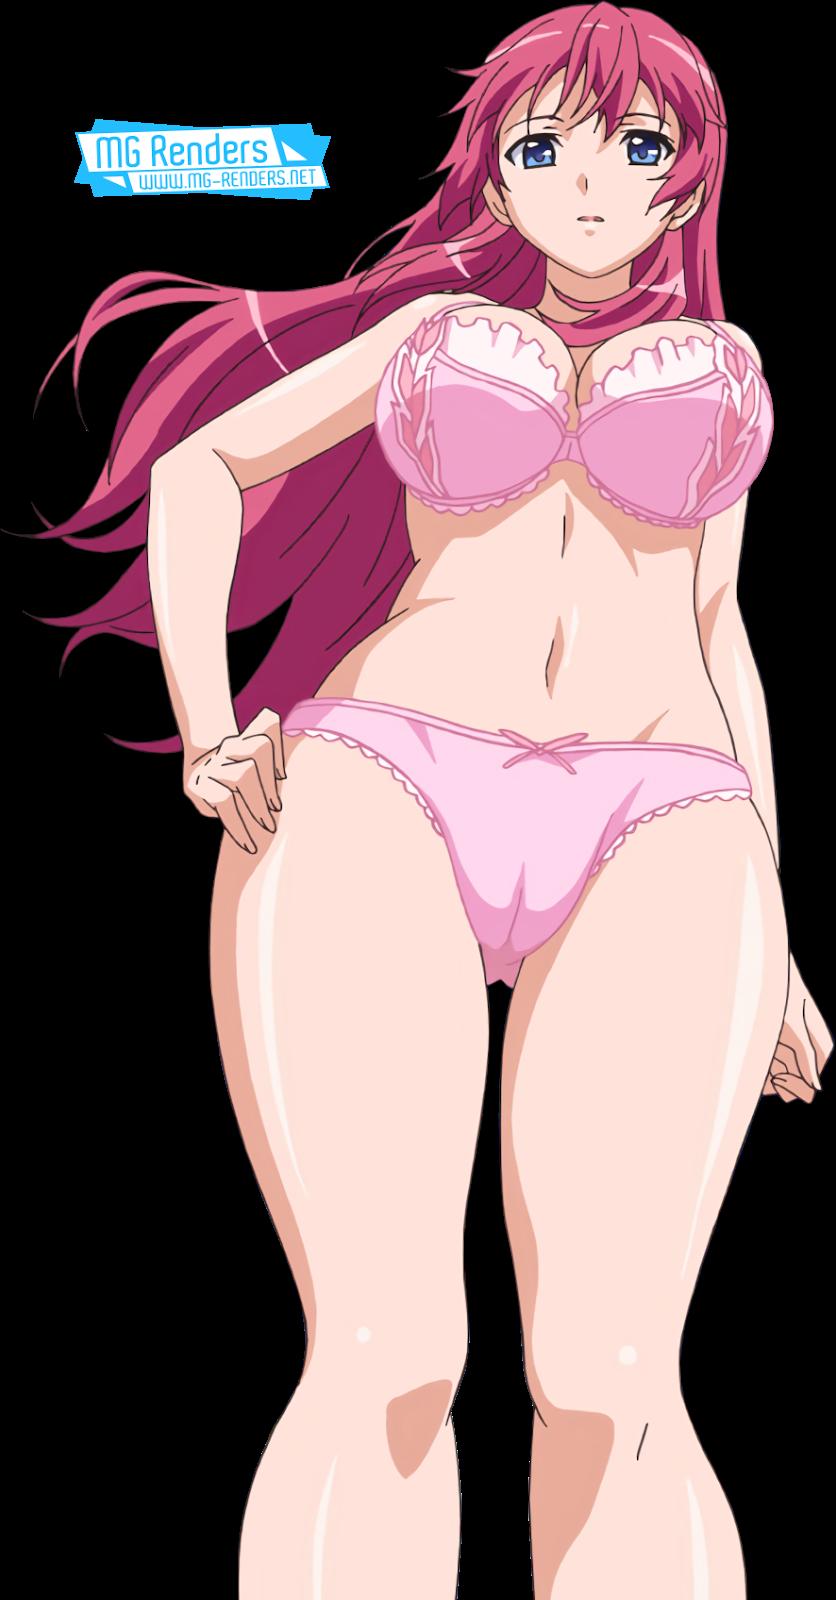 Tags: Anime, Render,  Maki-chan to Nau,  Pantsu,  Sanjou Maki,  PNG, Image, Picture